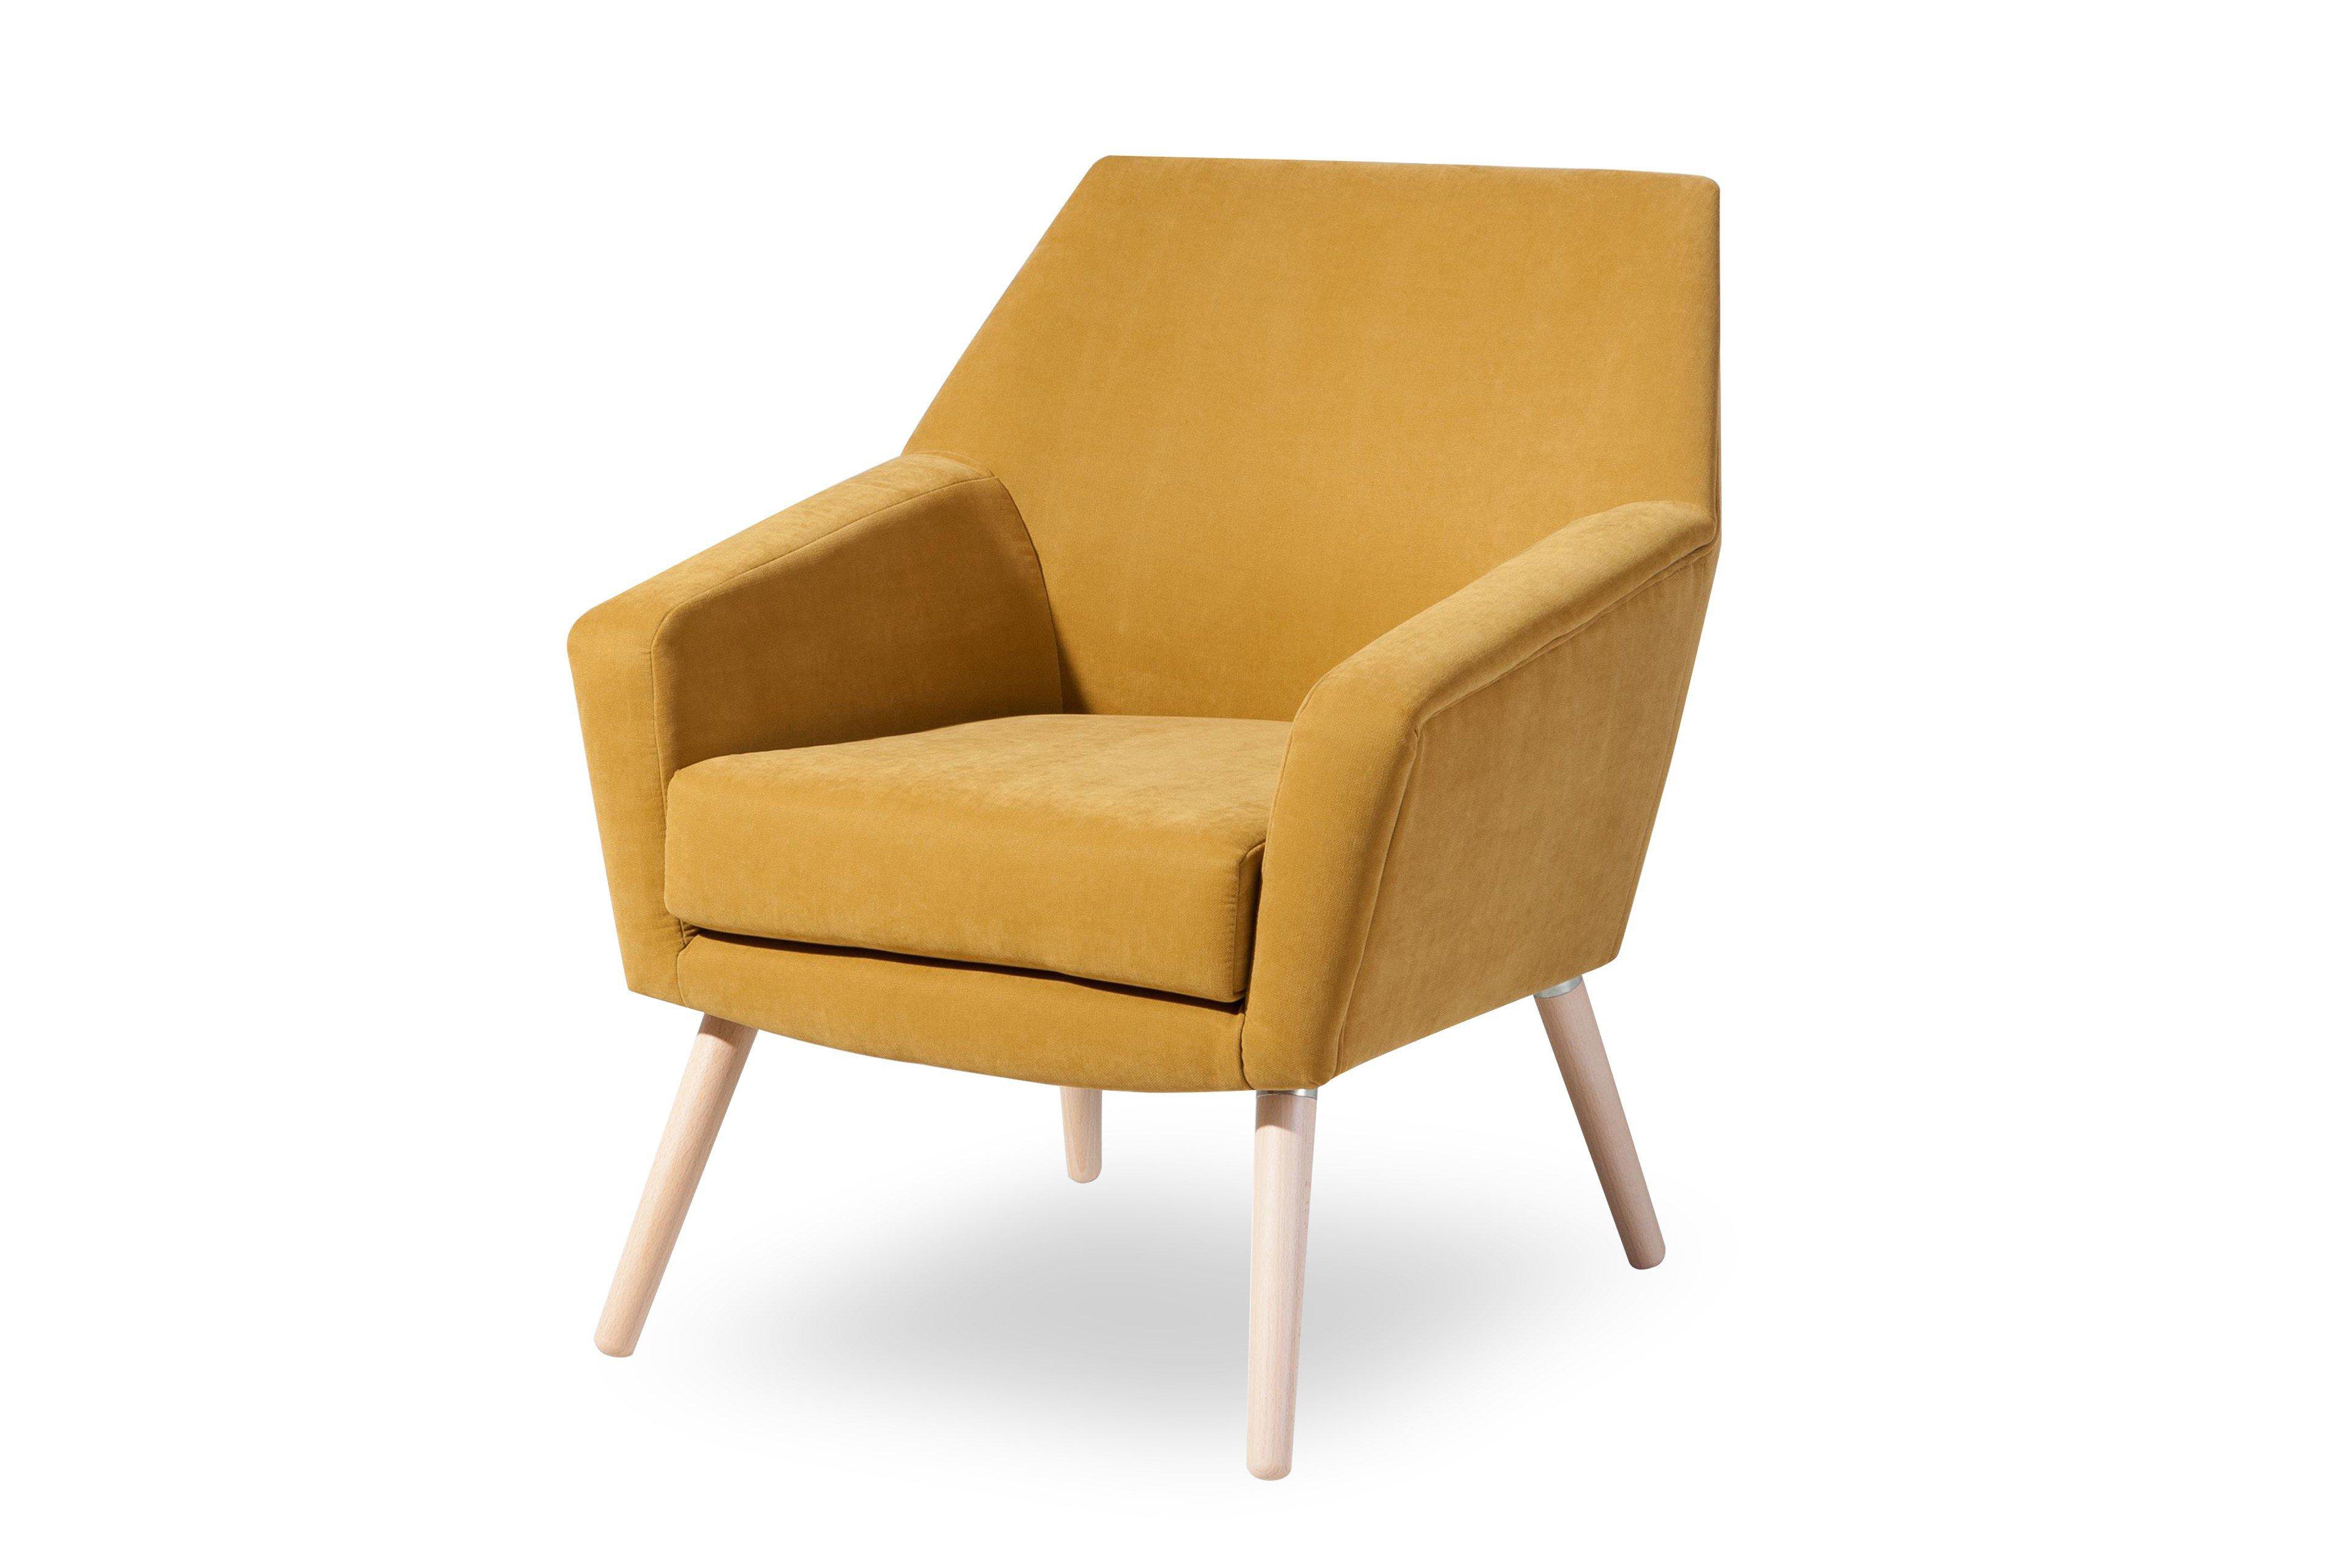 max winzer alegro sessel in gelb m bel letz ihr online shop. Black Bedroom Furniture Sets. Home Design Ideas